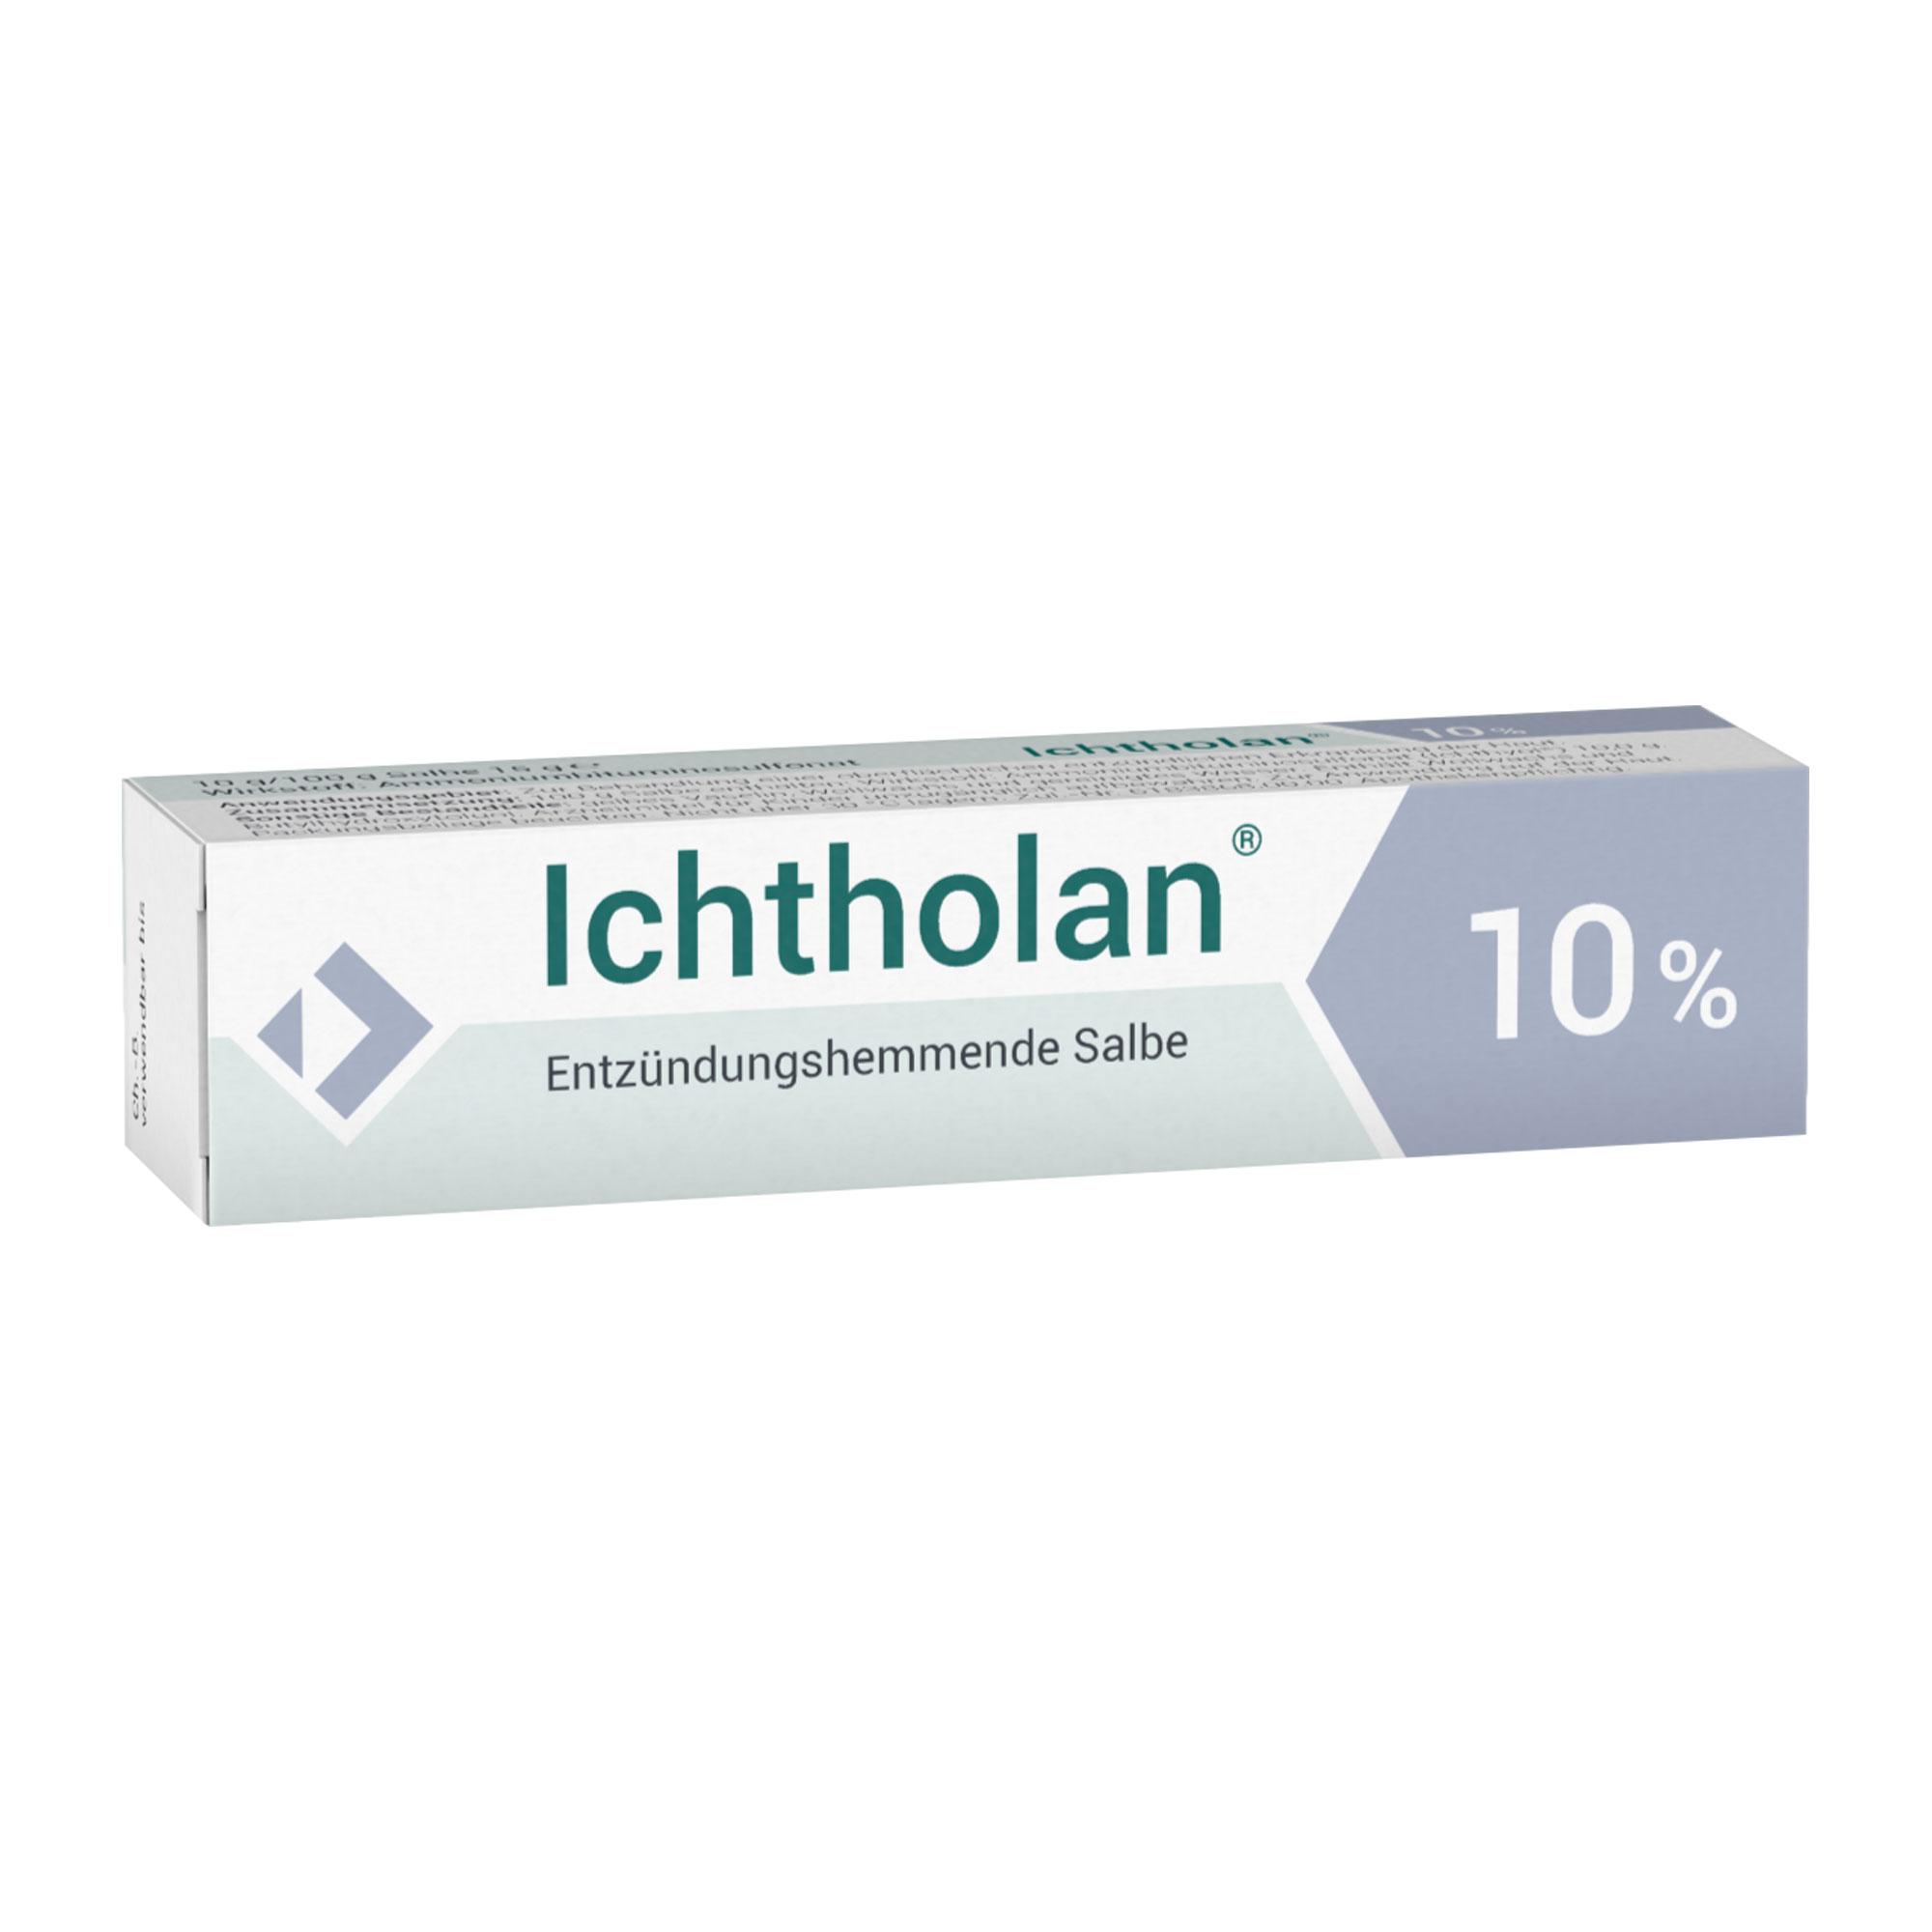 Ichtholan 10% Salbe